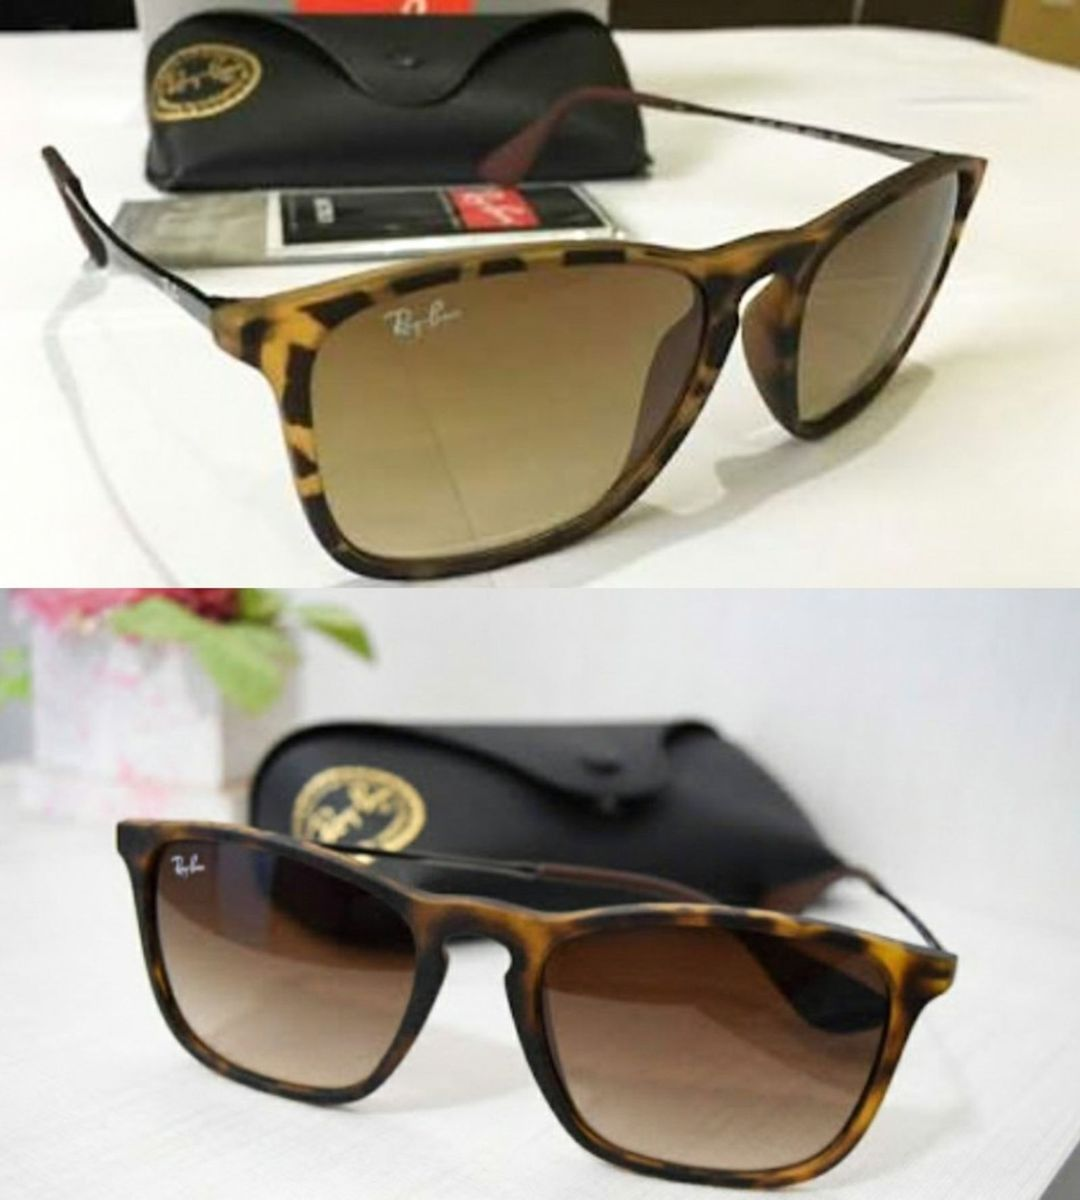 affaaa9532fe3 óculos ray-ban chris tartaruga oncinha lente marrom feminino - óculos ray- ban